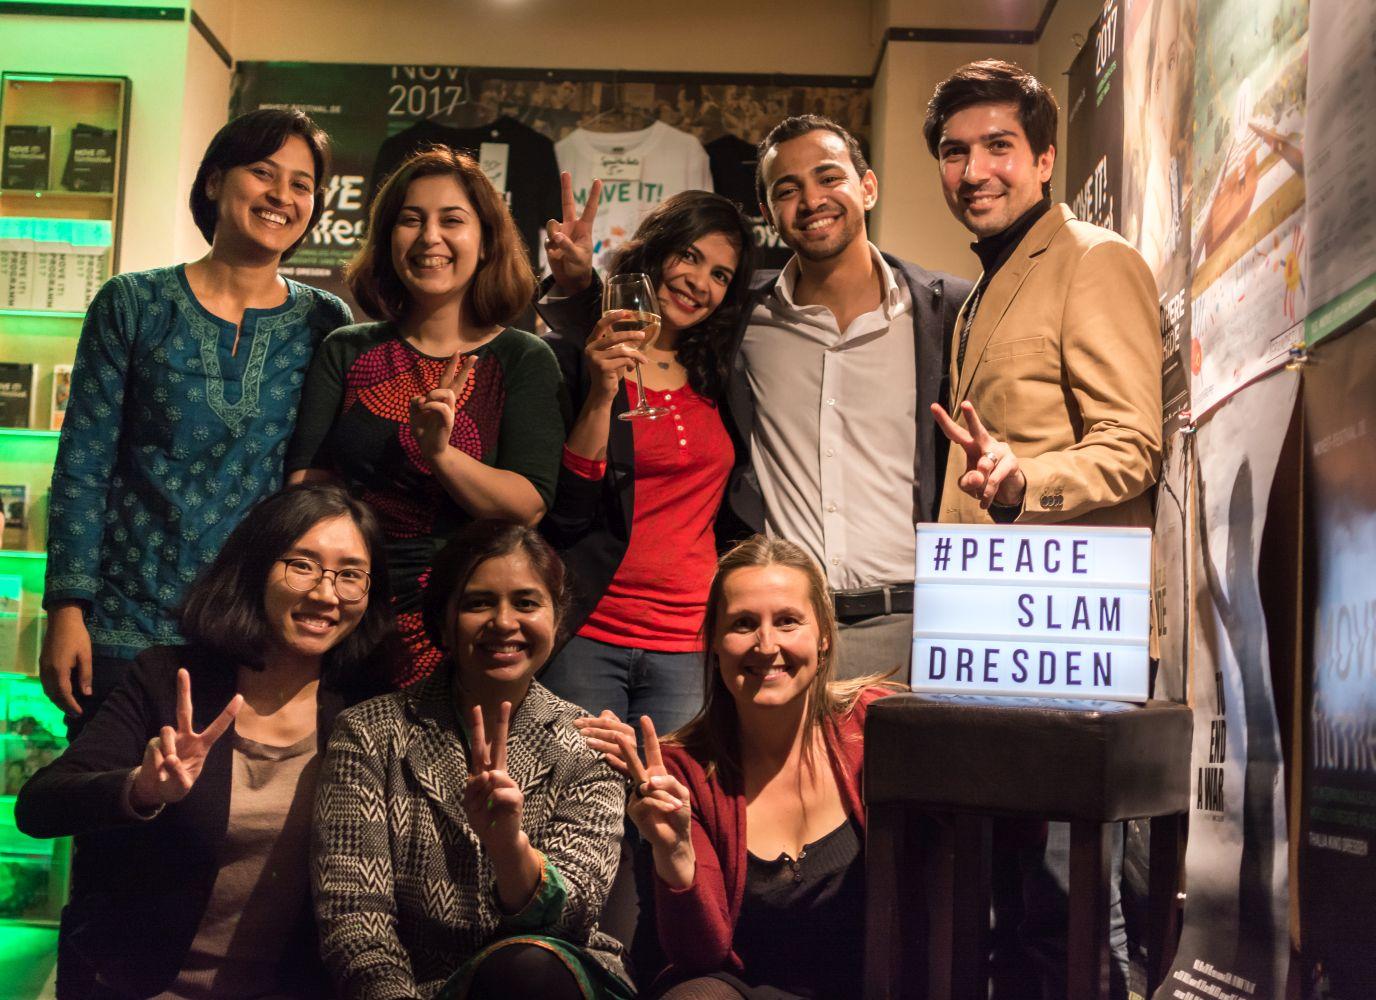 Mic4Peace beim internationalen Peace Slam am 15.11.2017 im Thalia Kino Dresden